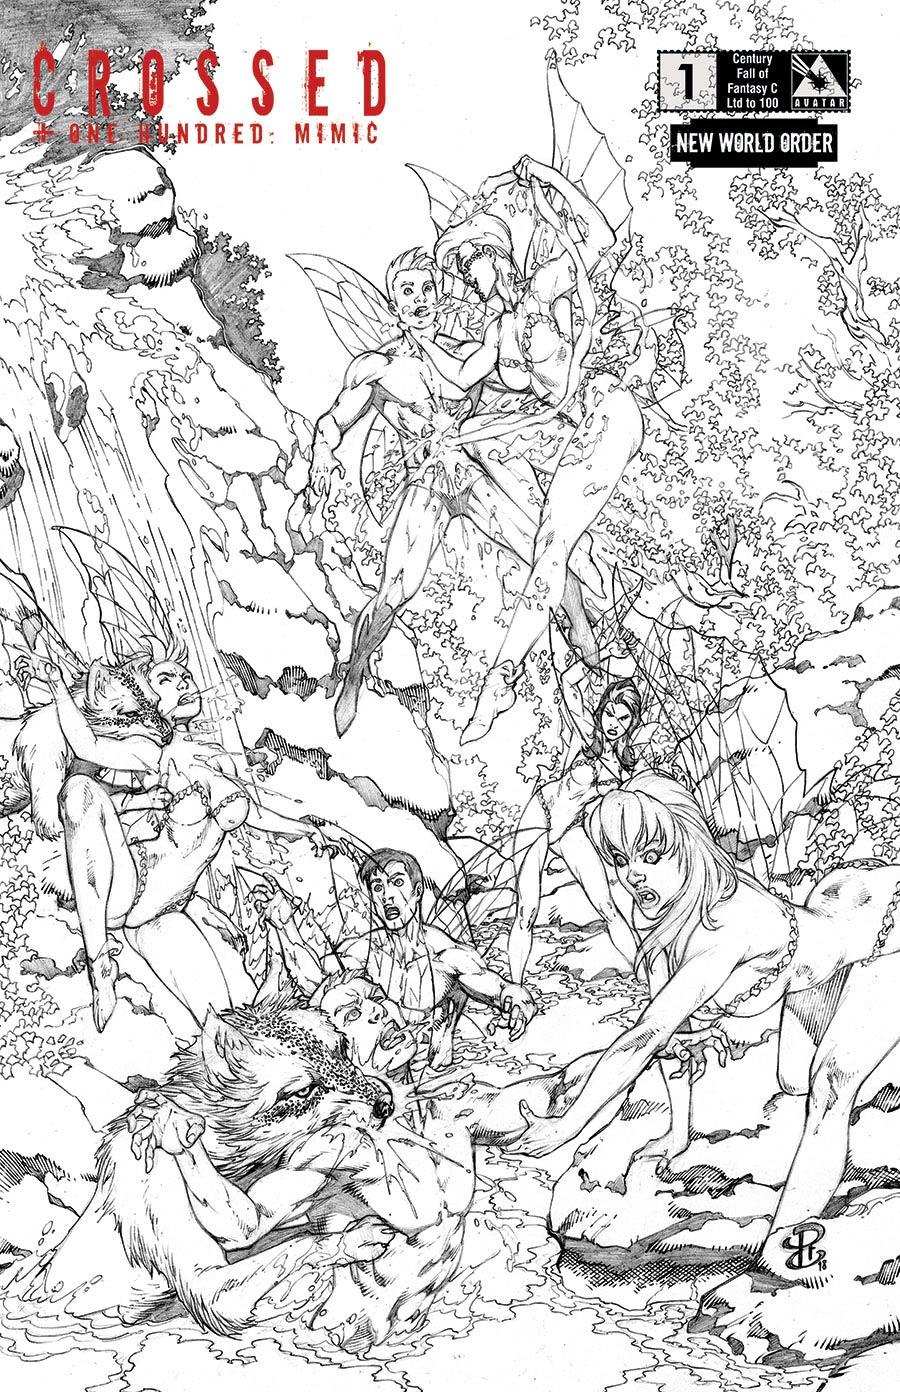 Crossed Plus 100 Mimic #1 Cover O NWO Century Fall Of Fantasy C Cover